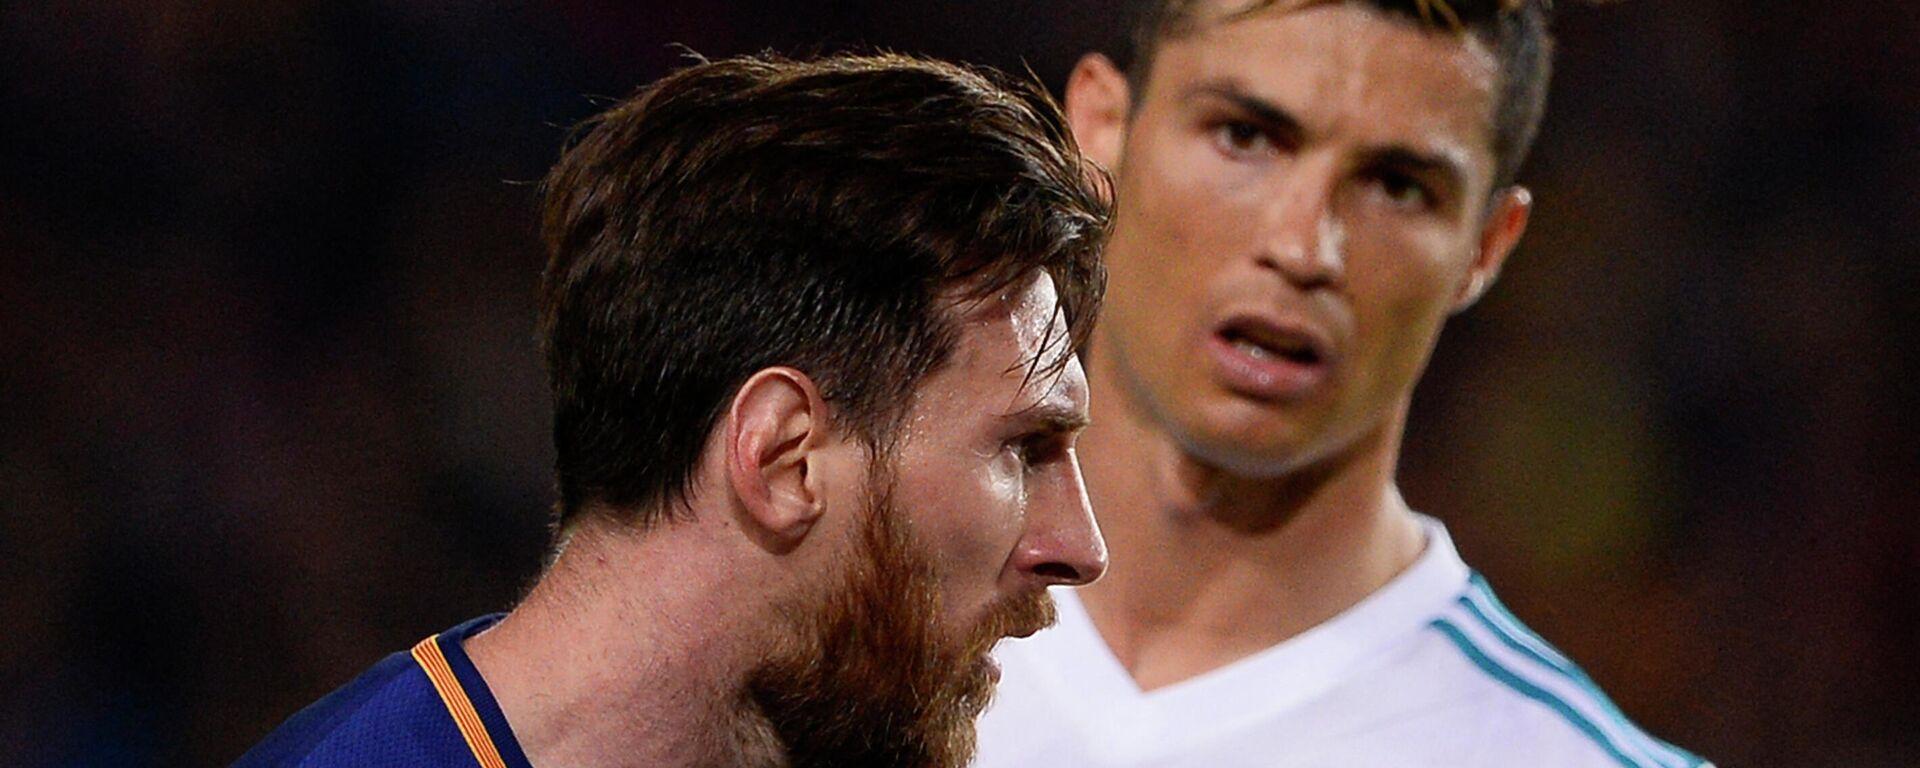 Lionel Messi y Cristiano Ronaldo - Sputnik Mundo, 1920, 20.09.2021